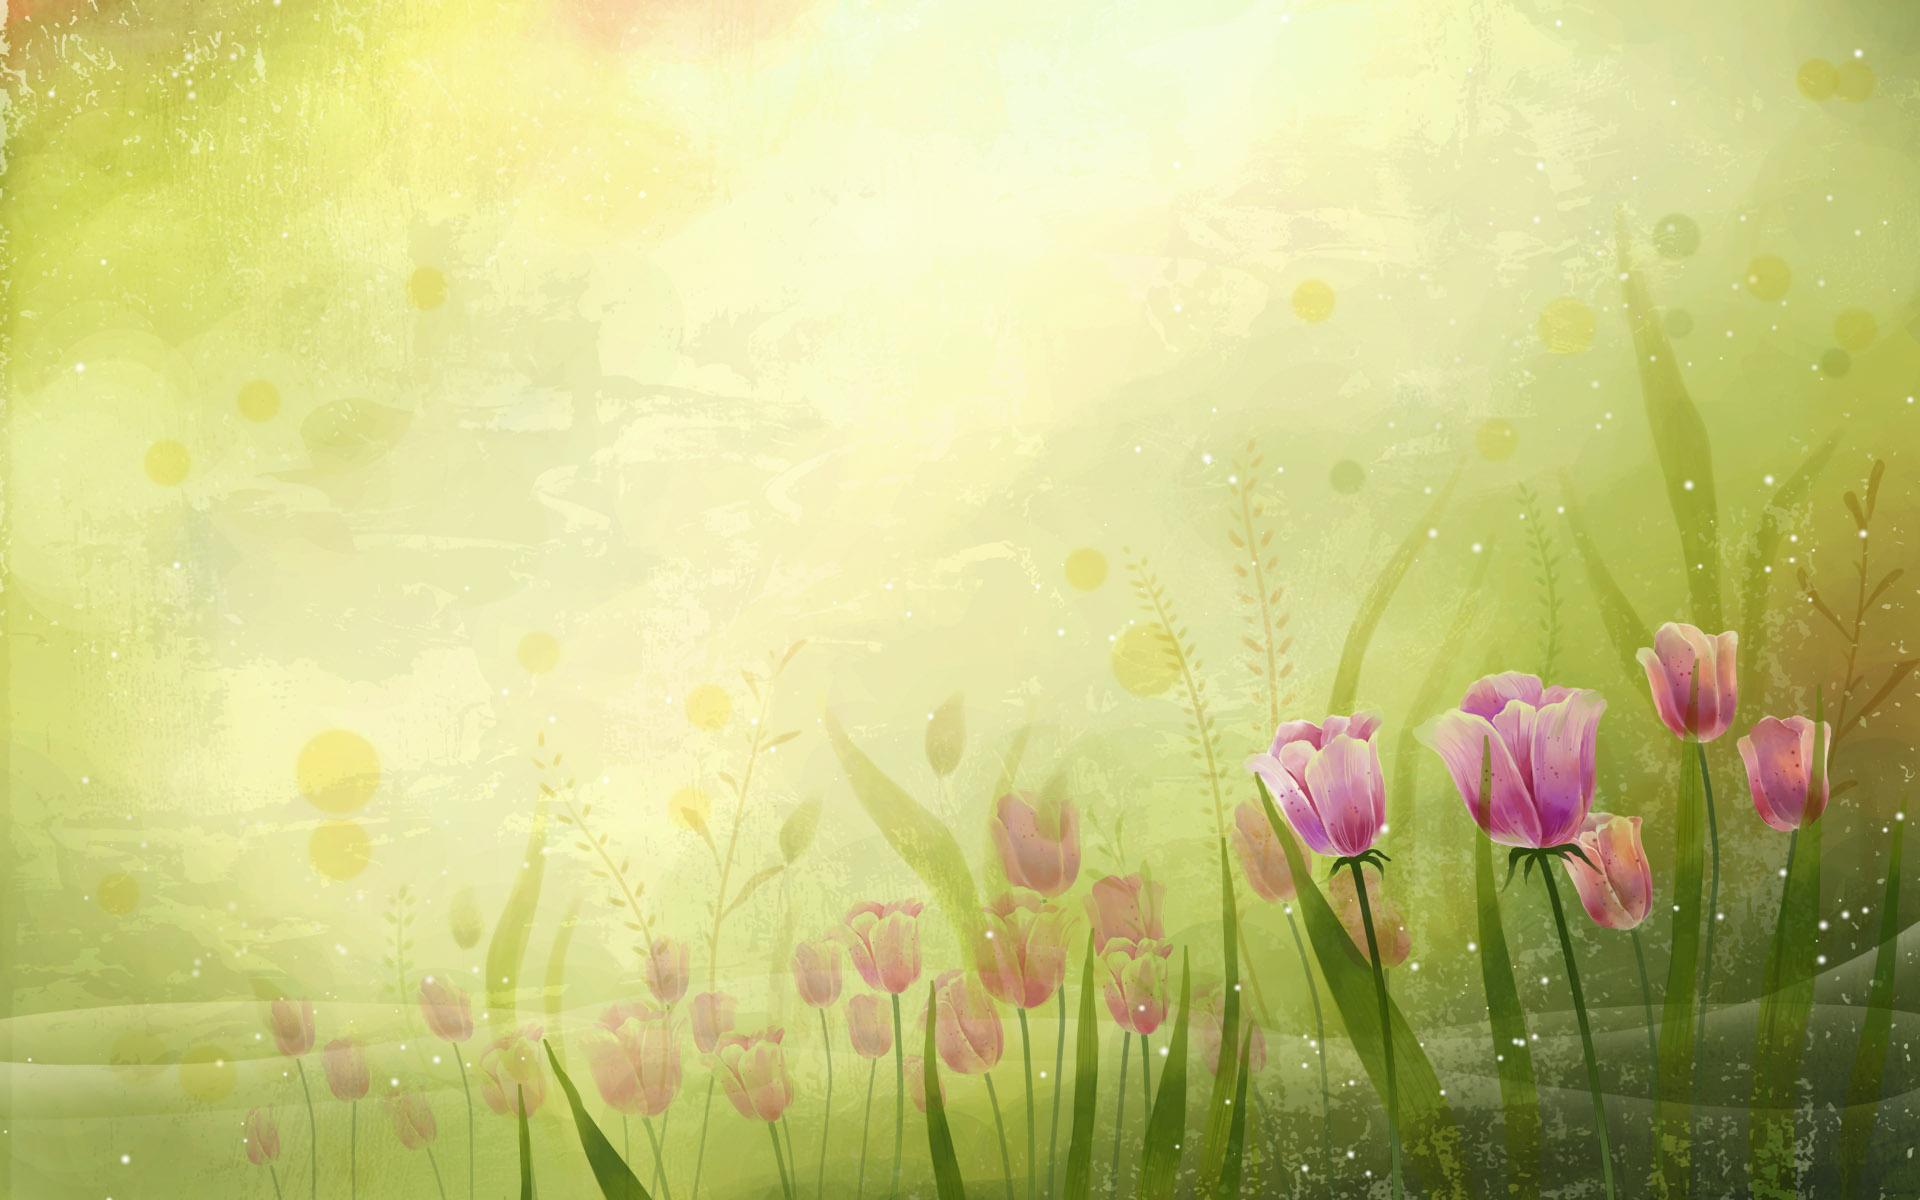 Spring Flowers Desktop Wallpaper Background